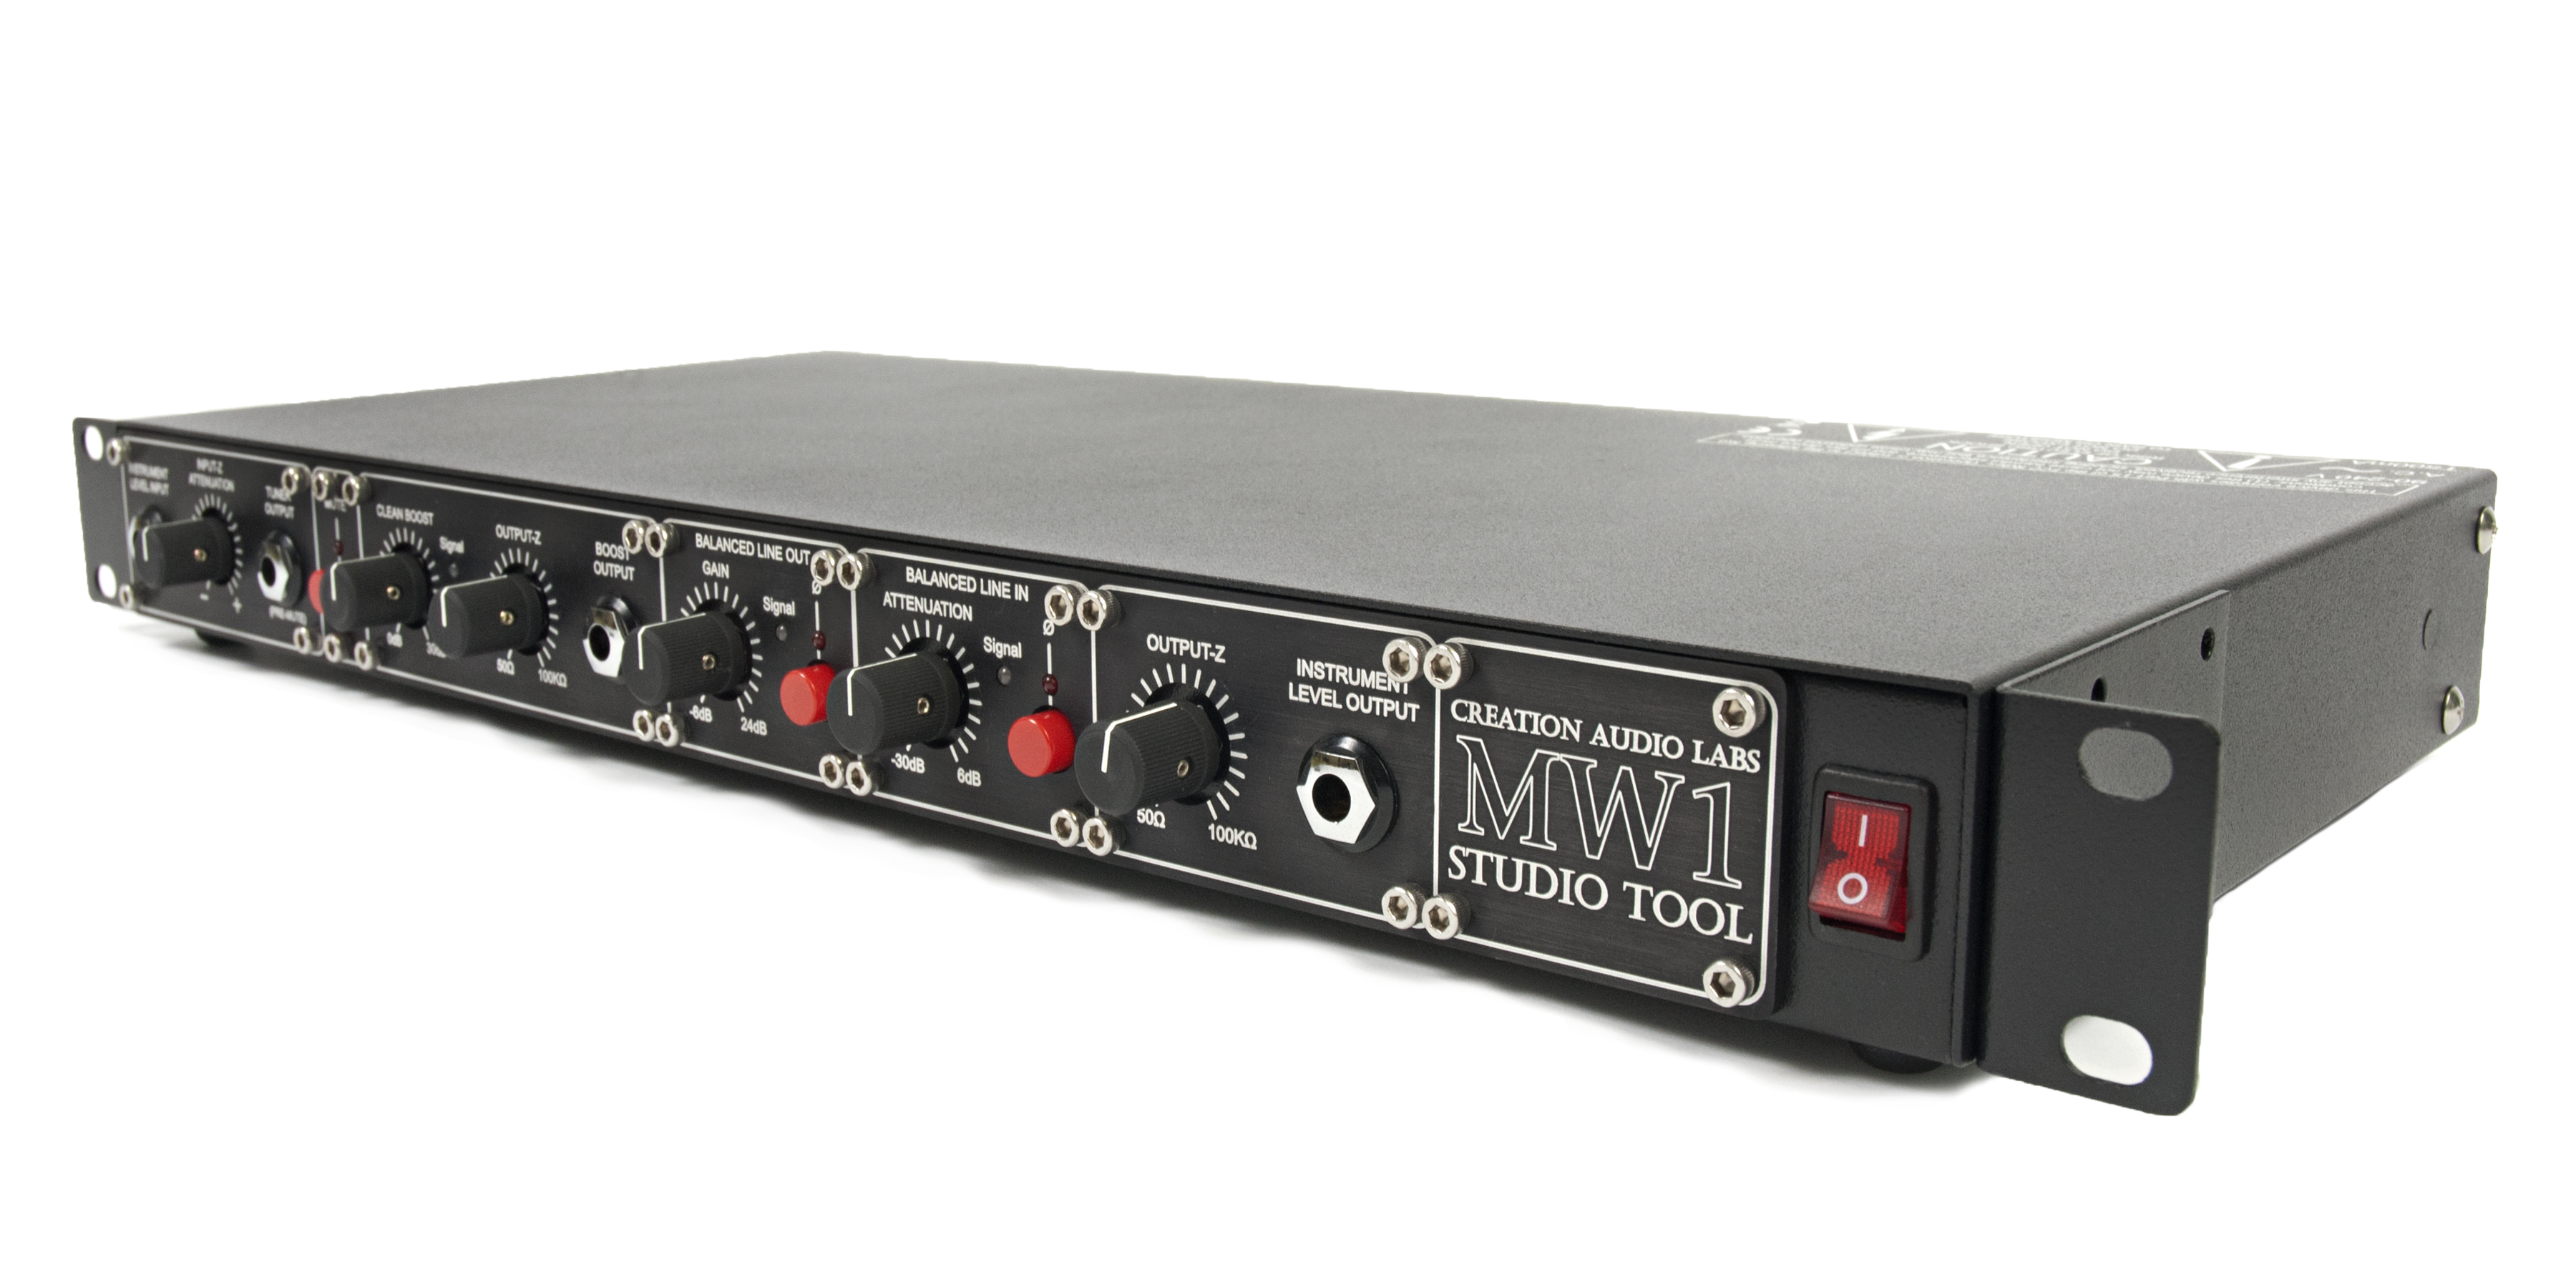 MW1 Studio Tool